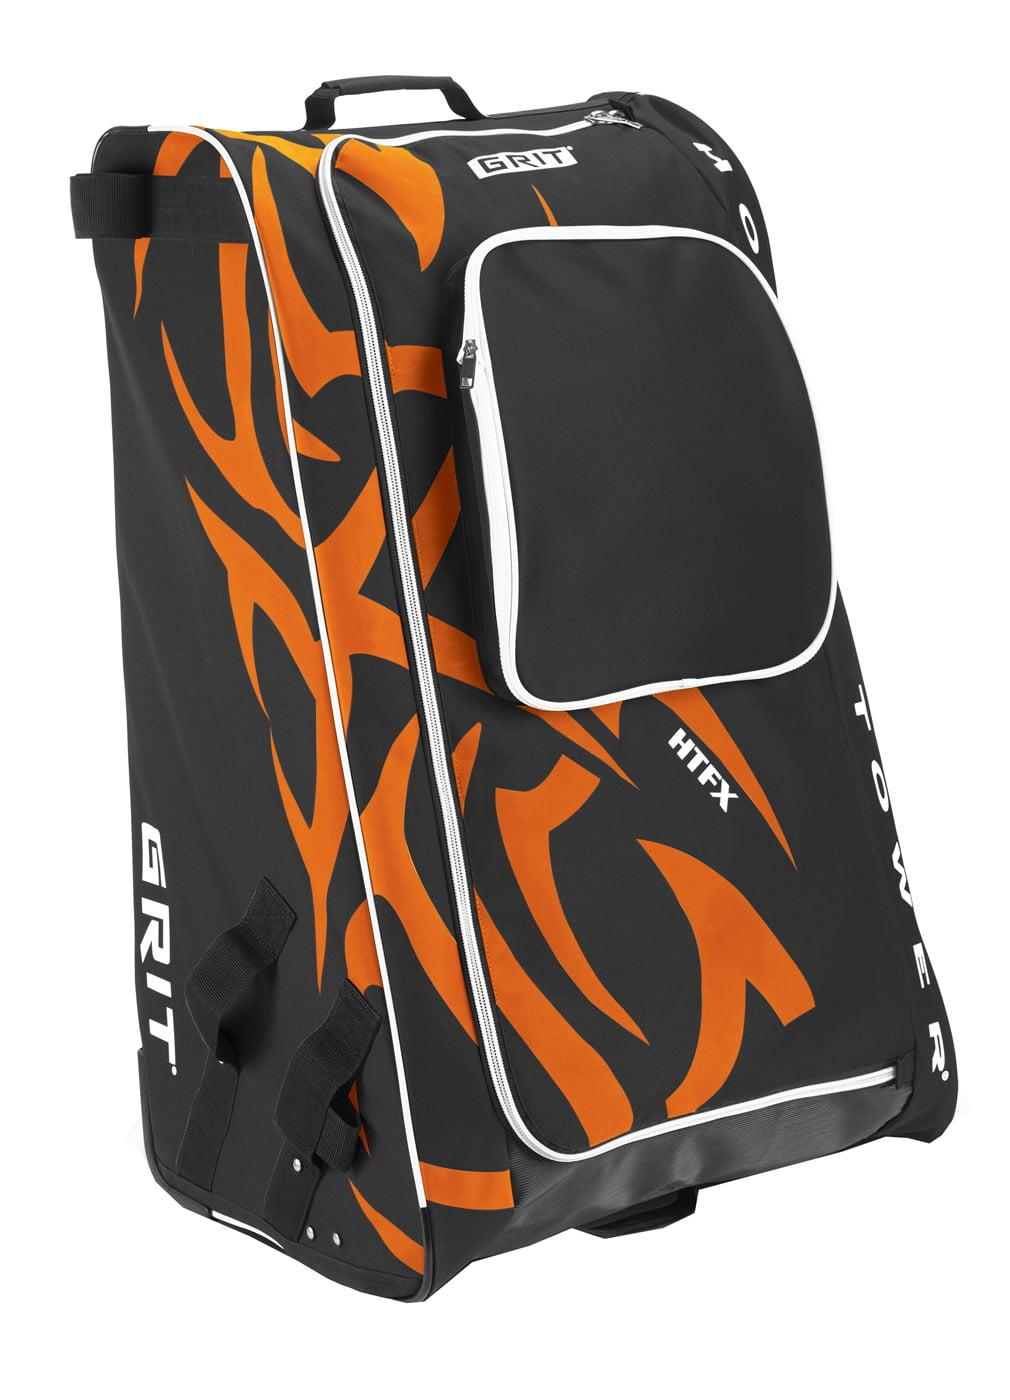 "Grit Inc HTFX Hockey Tower 36/"" Wheeled Equipment Bag Navy HTFX036-NY Navy"